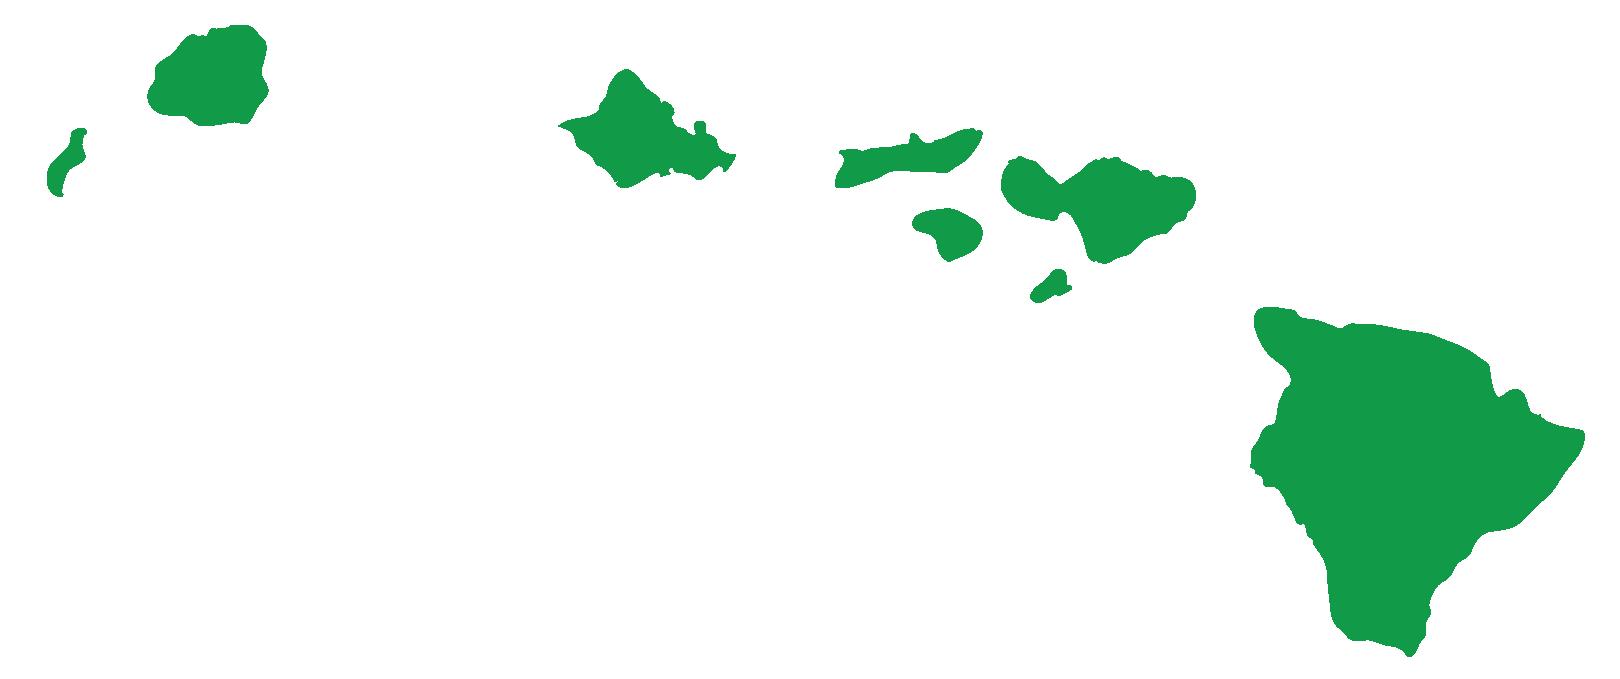 SPED-HawaiianIslands